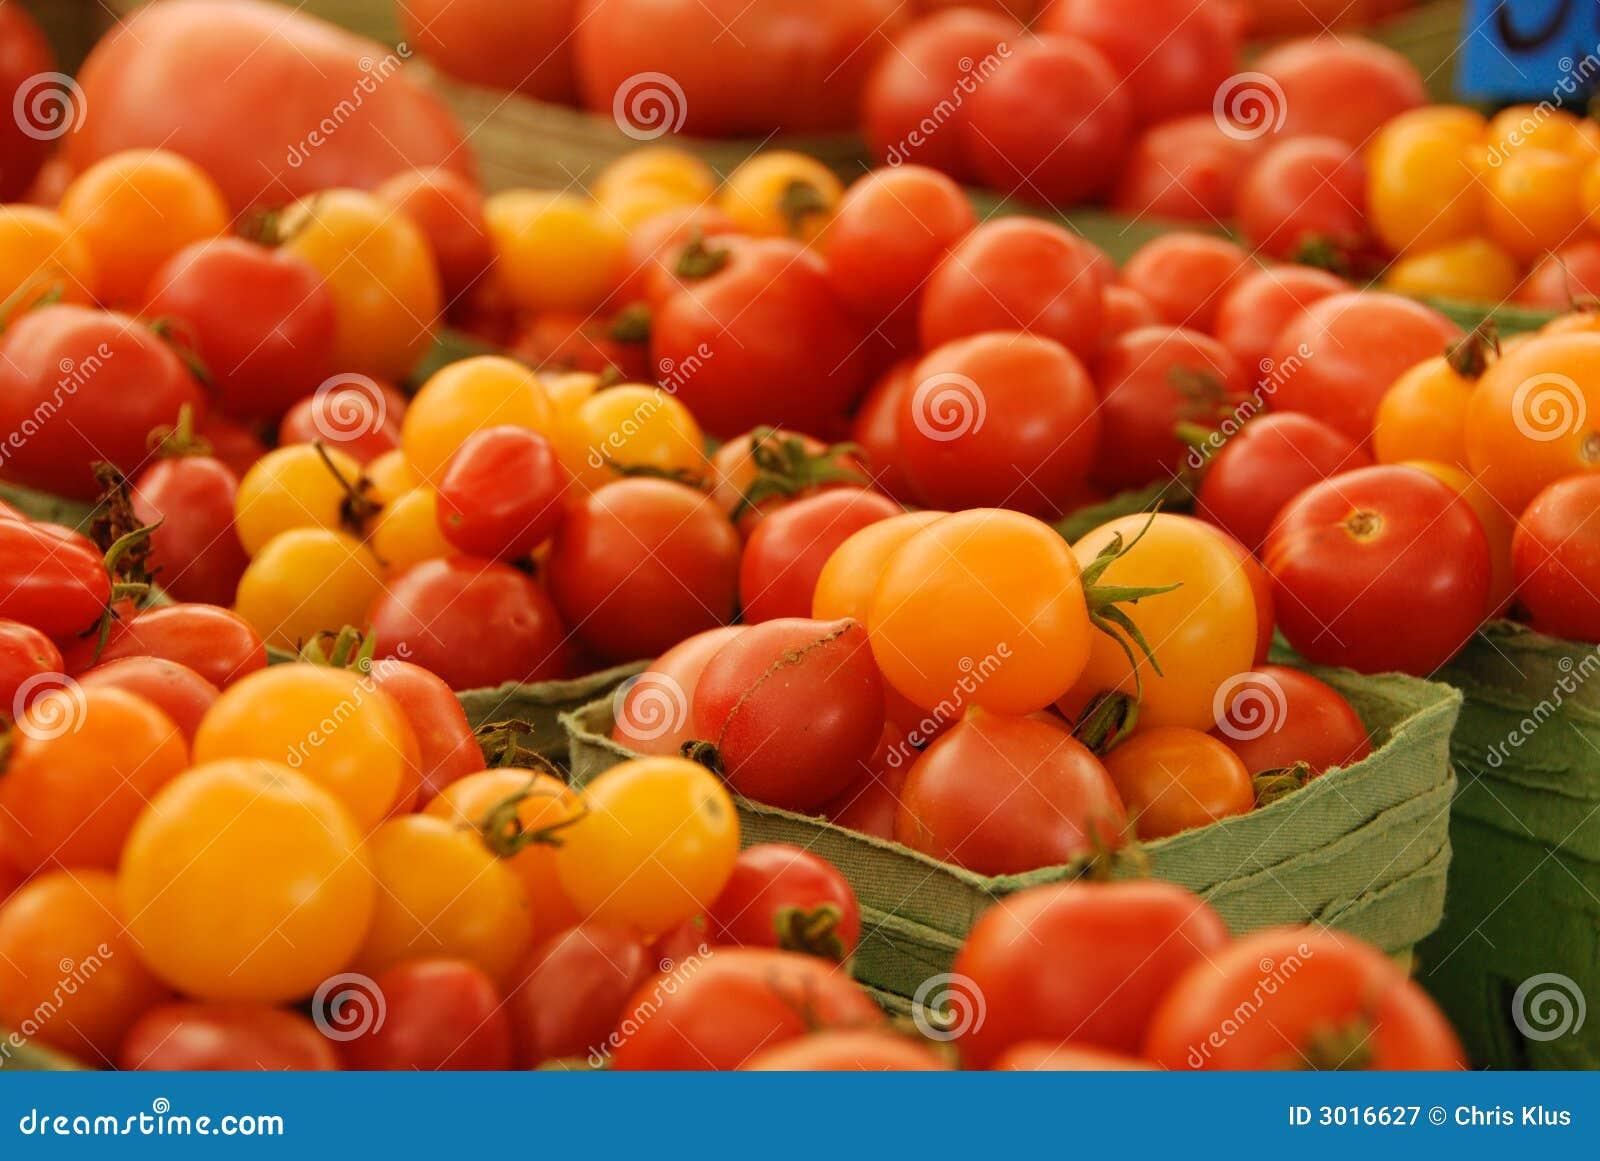 Tomates rouges et jaunes